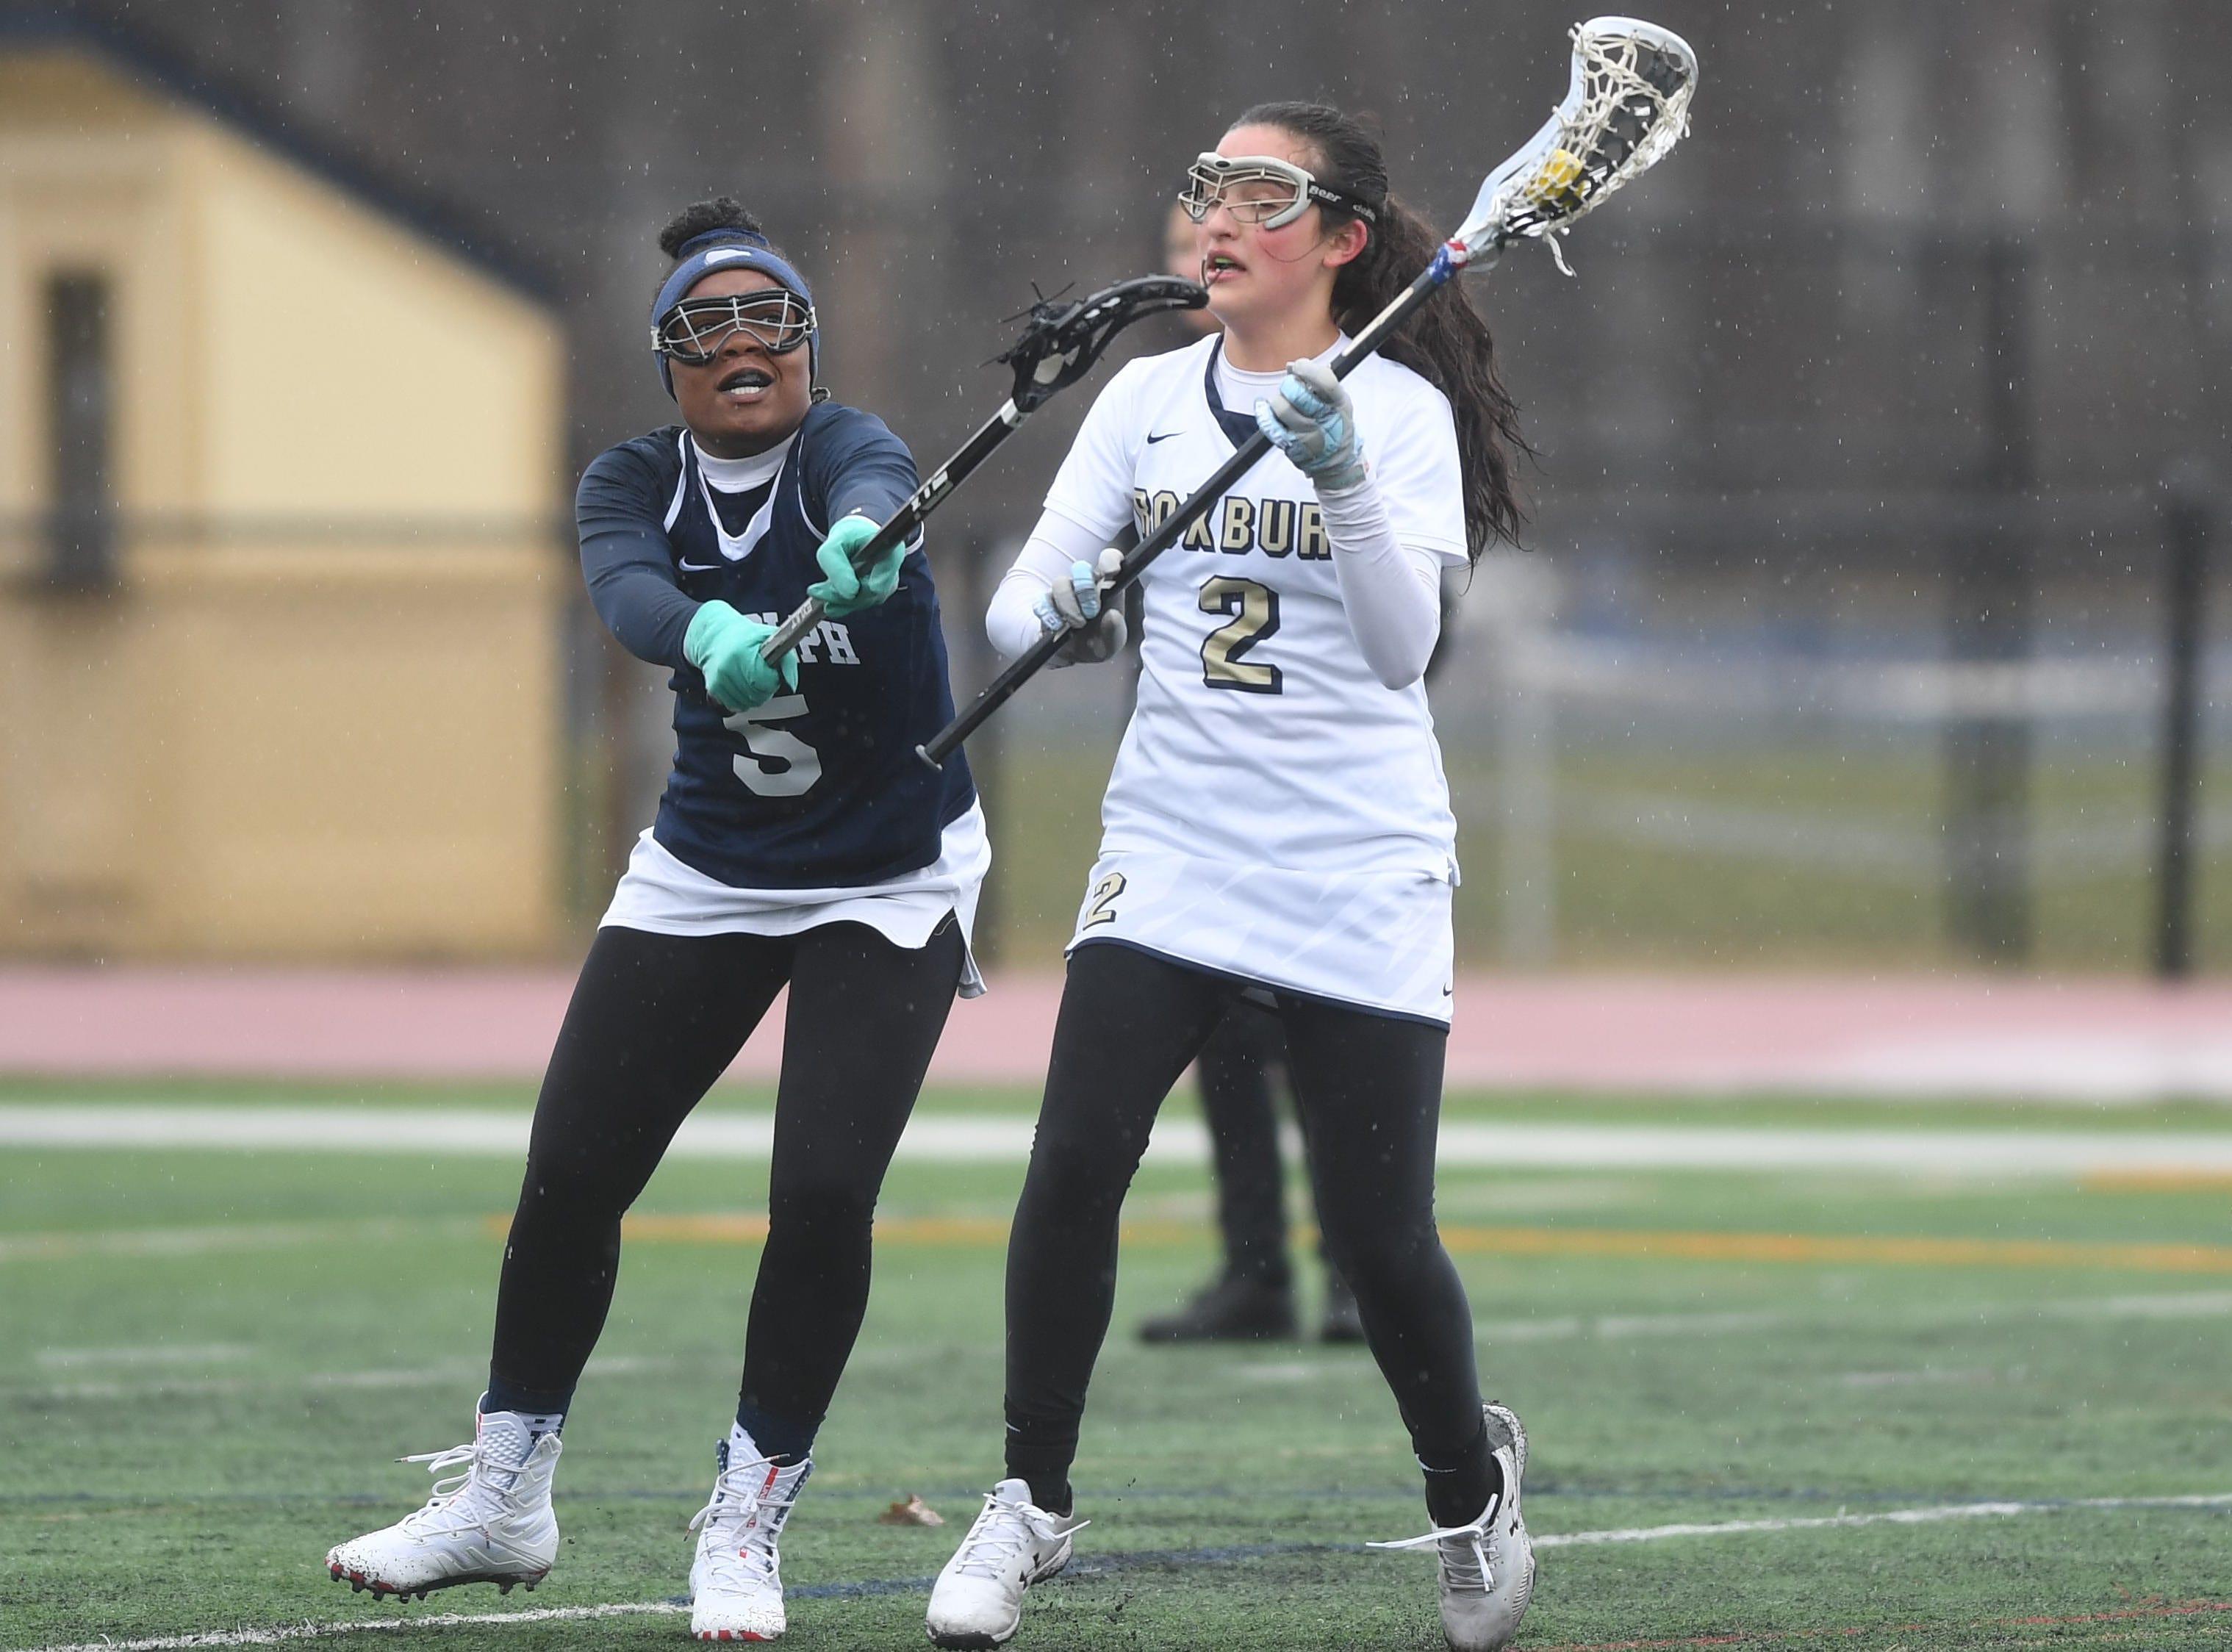 Randolph girls lacrosse at Roxbury on Friday, April 5, 2019. Roxbury  #2 Emily Stanich and Randolph #5 Kristine Lynch.